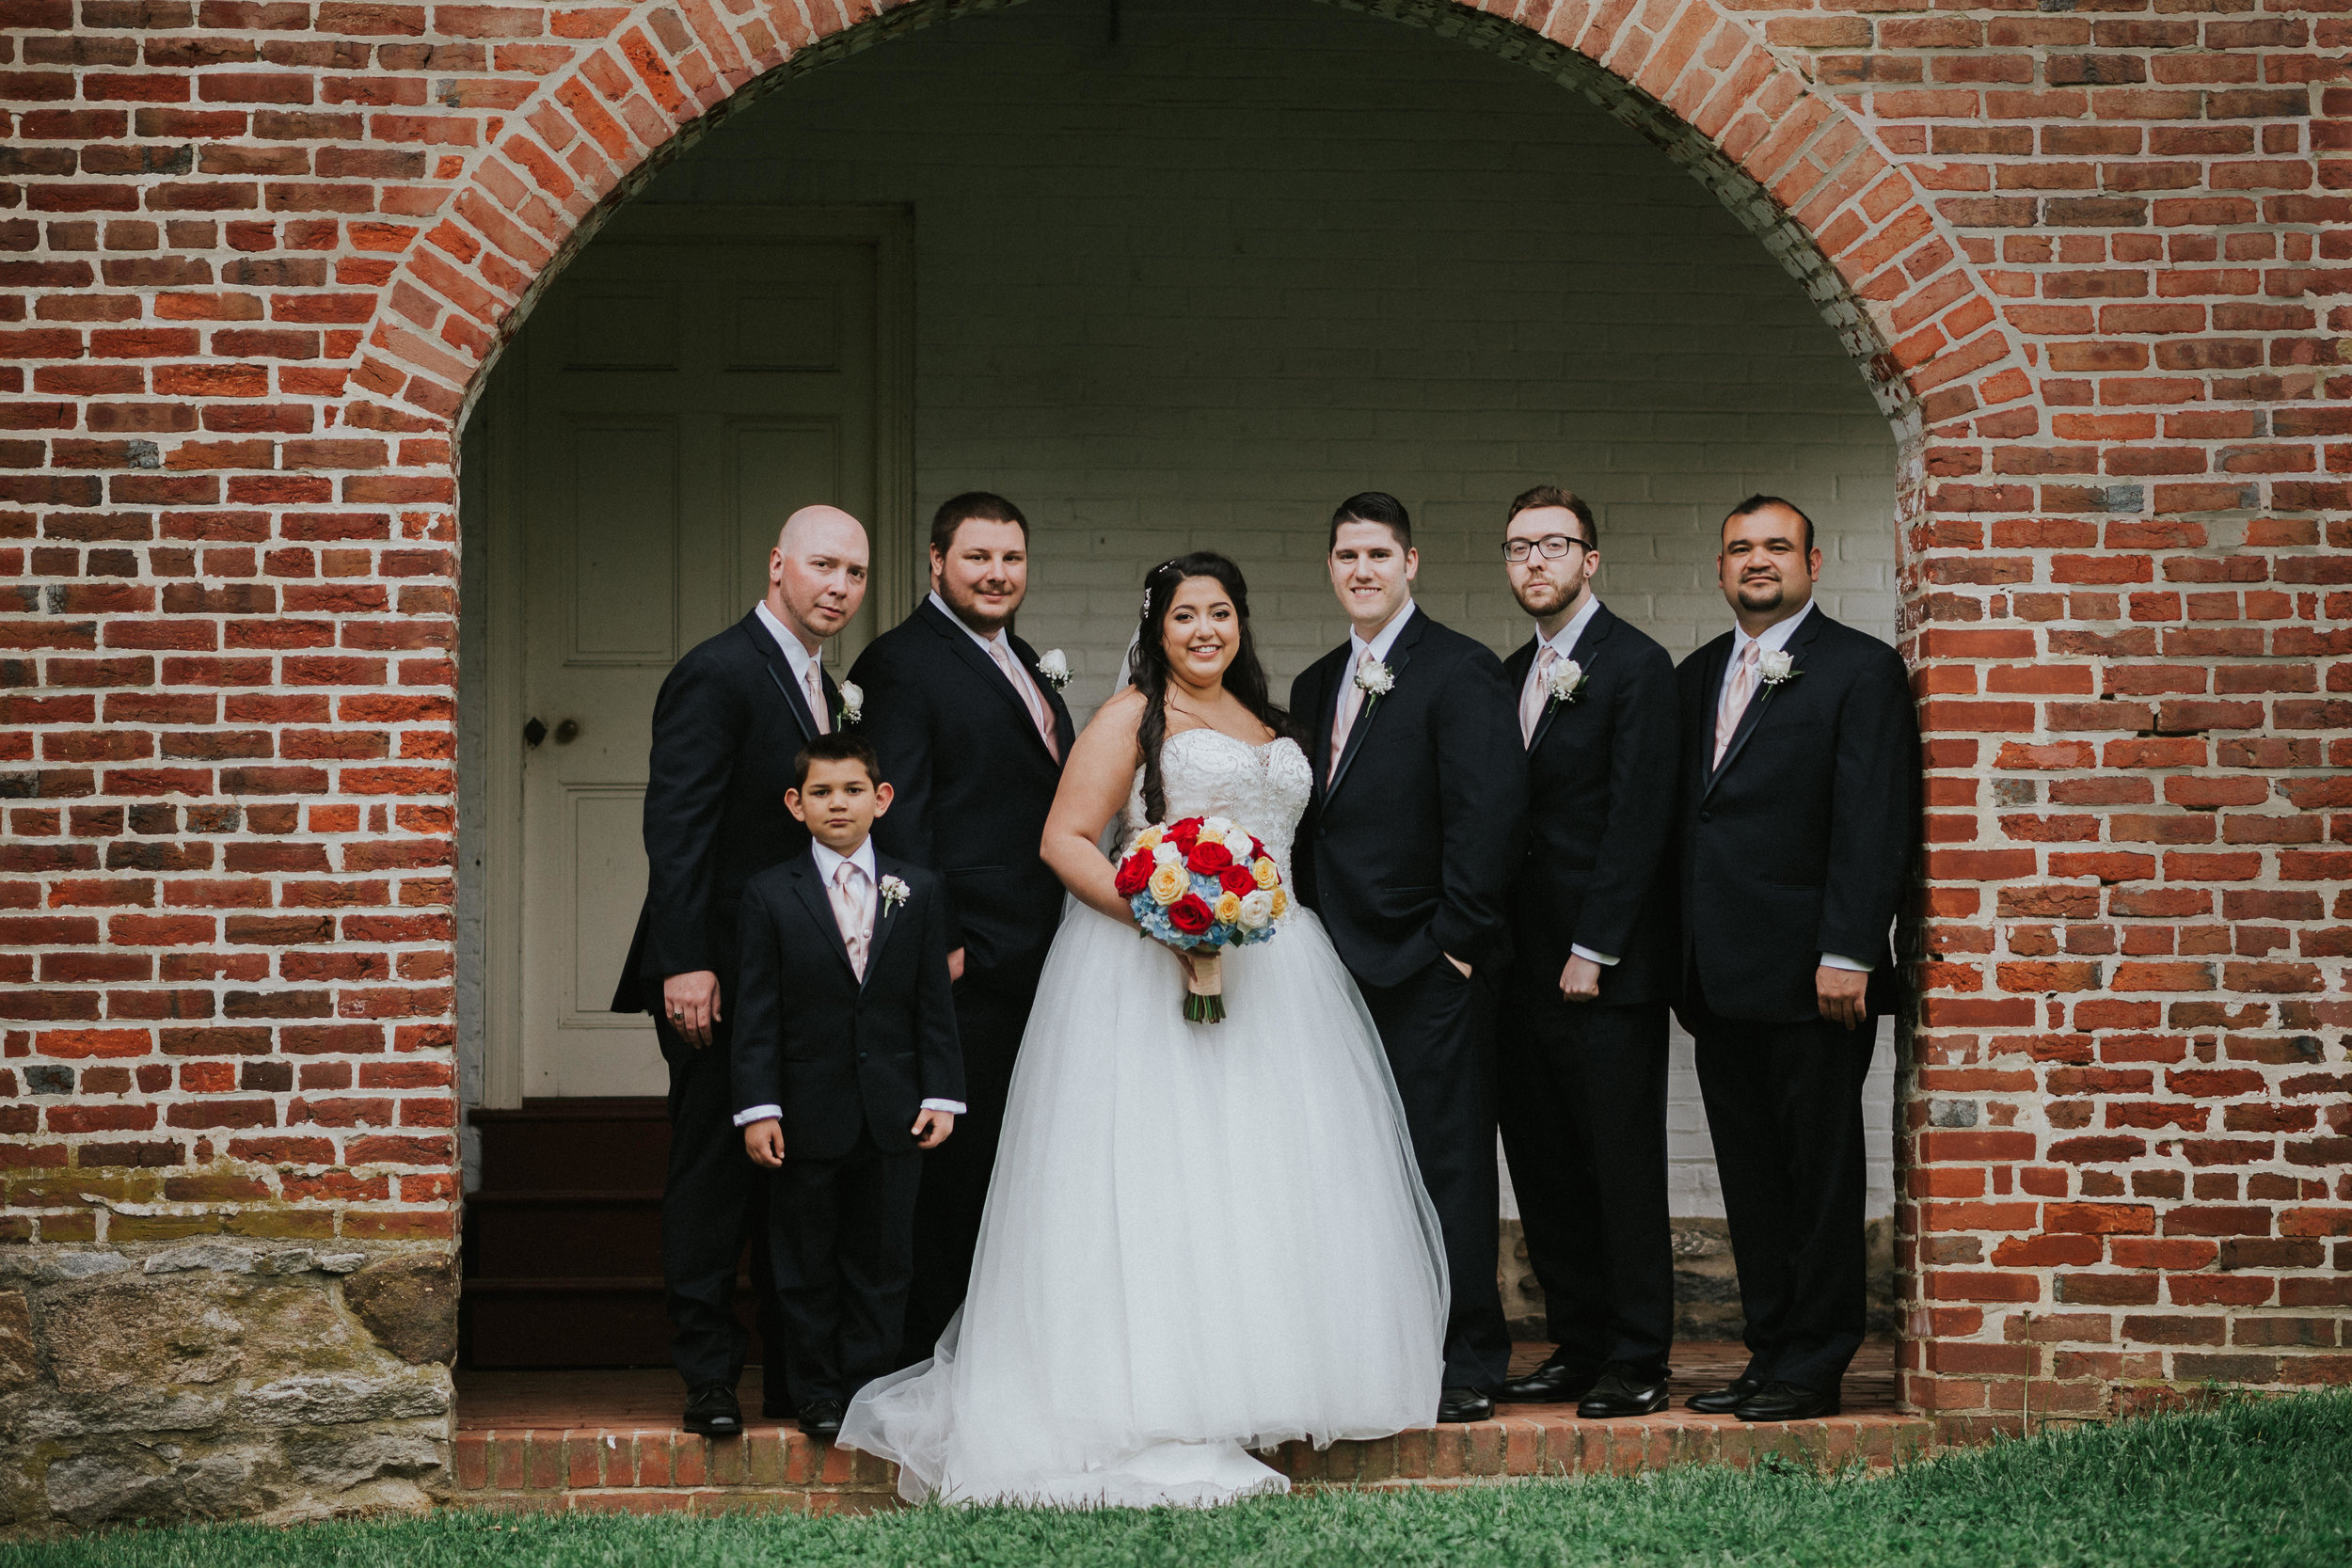 Barclay-Farmstead-Wedding-Rosa-and-Mike-437.jpg